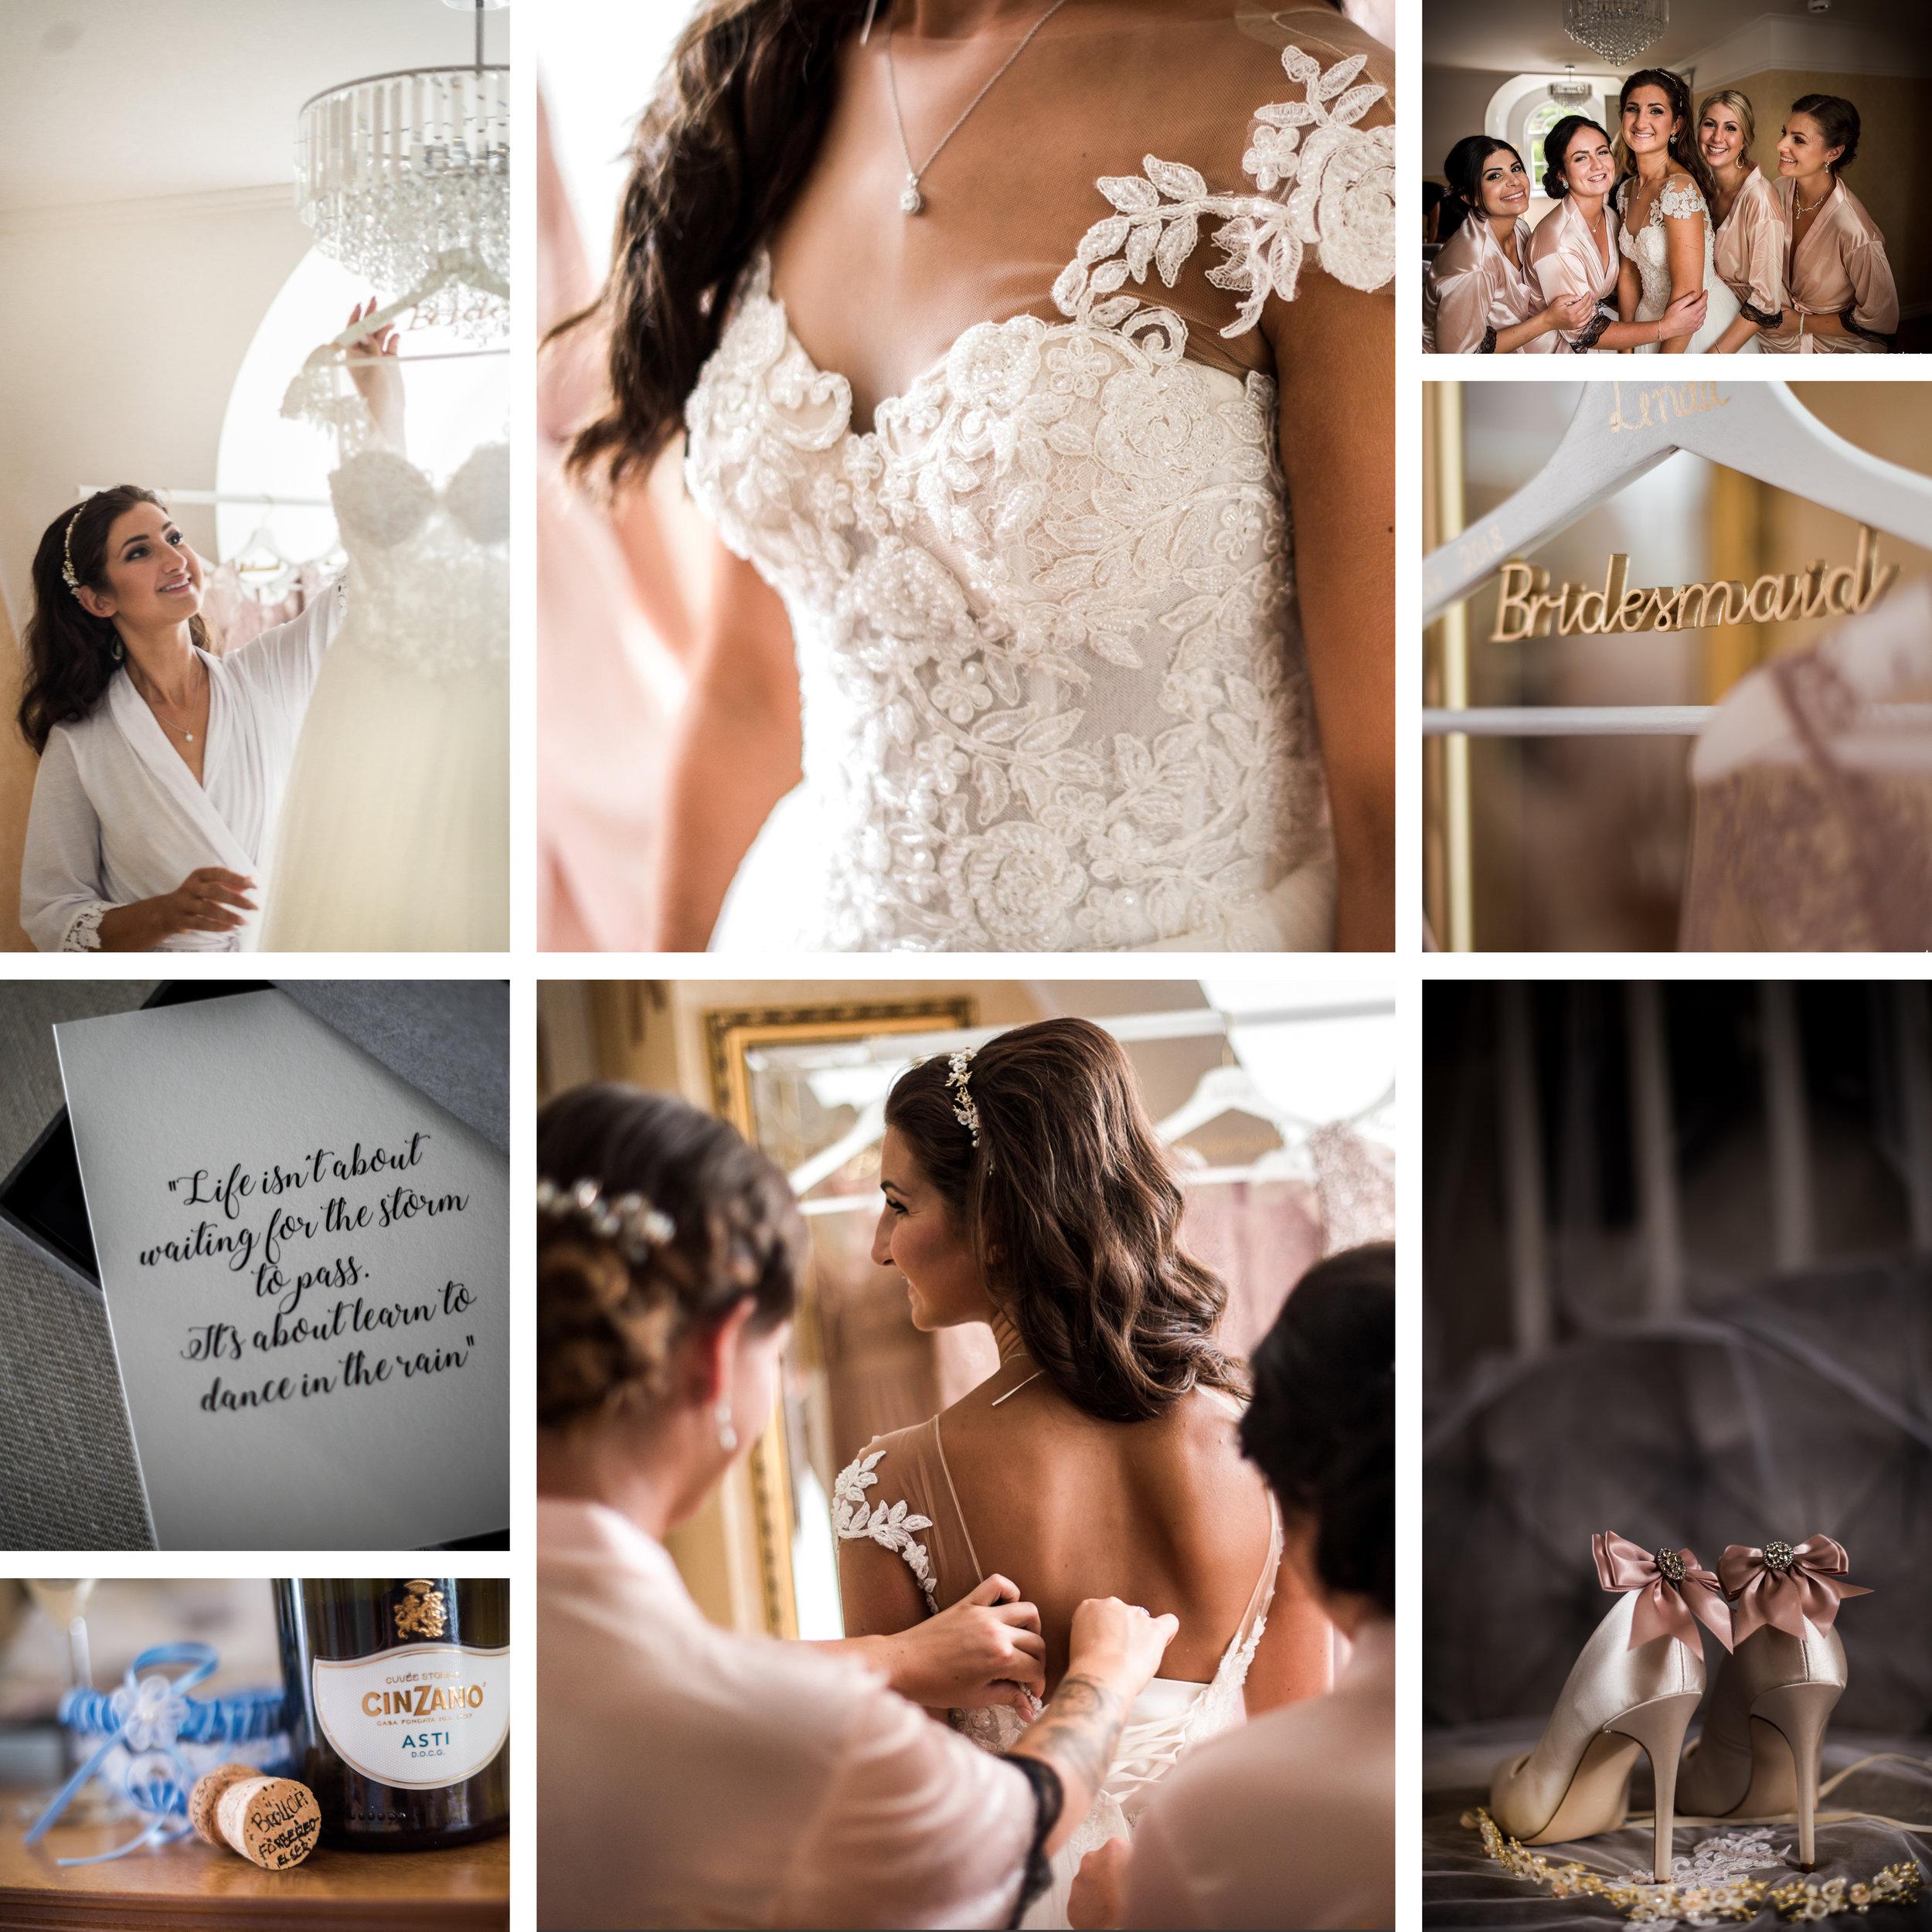 Bröllopsdetaljer av Kristin - Photography.jpg